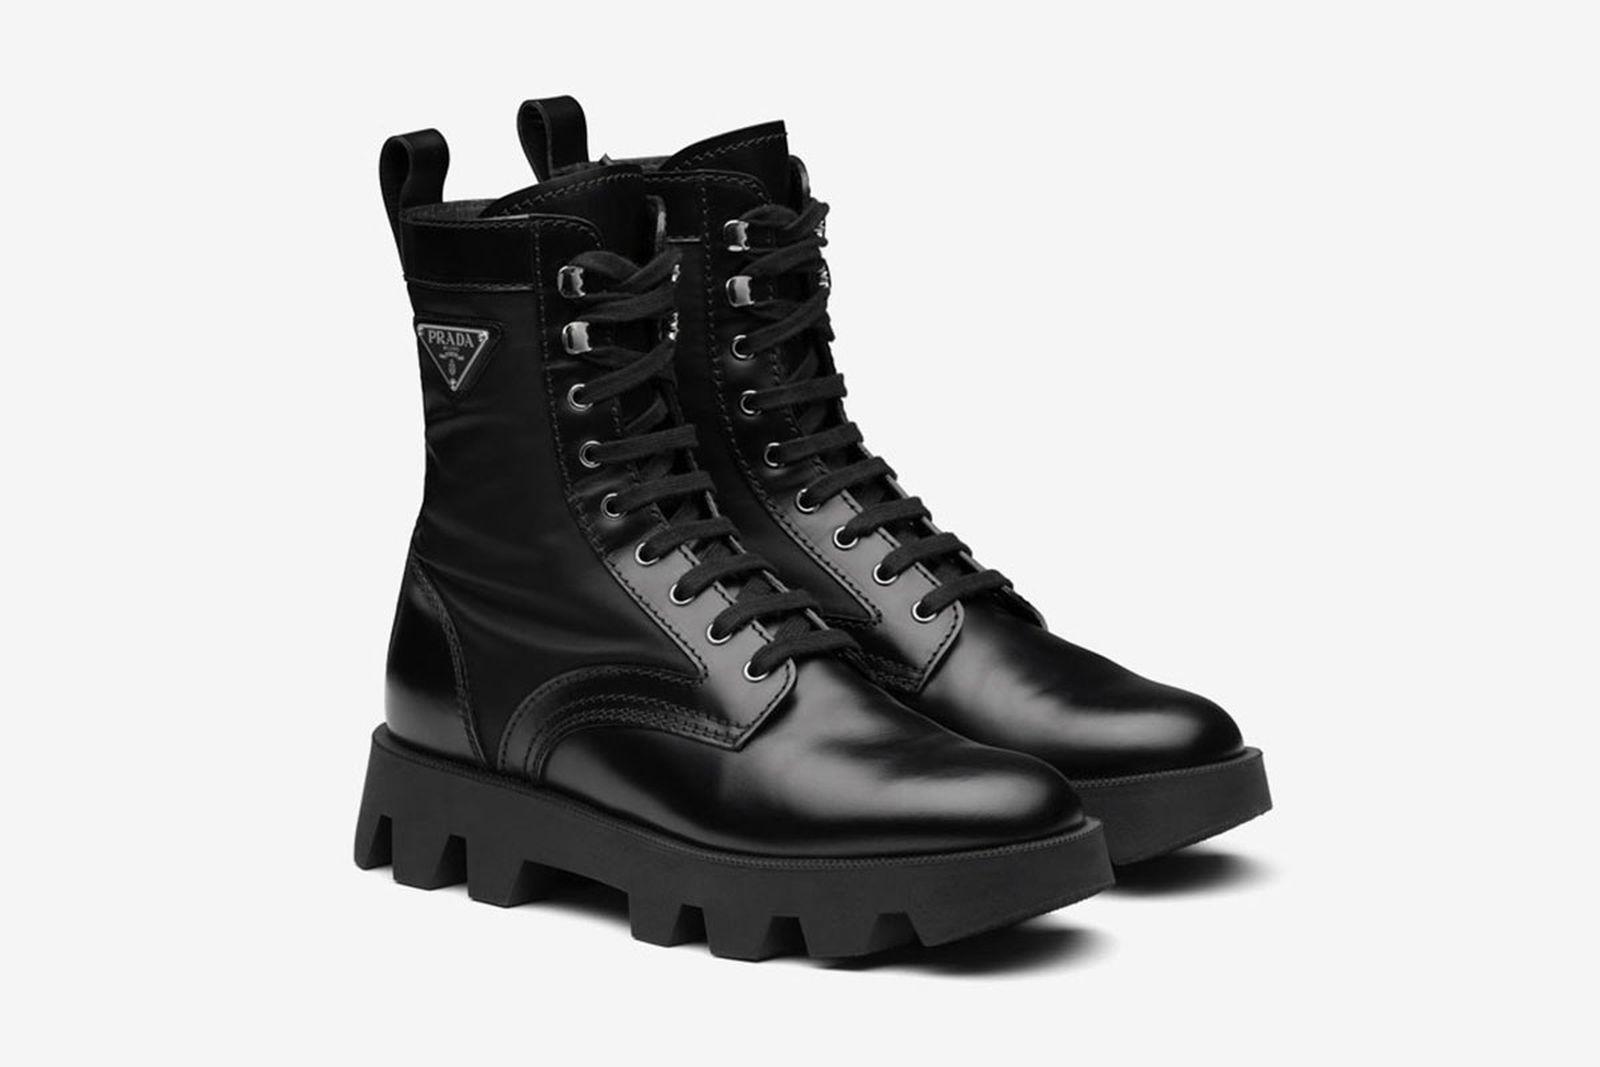 prada-nylon-boots-fw19-01